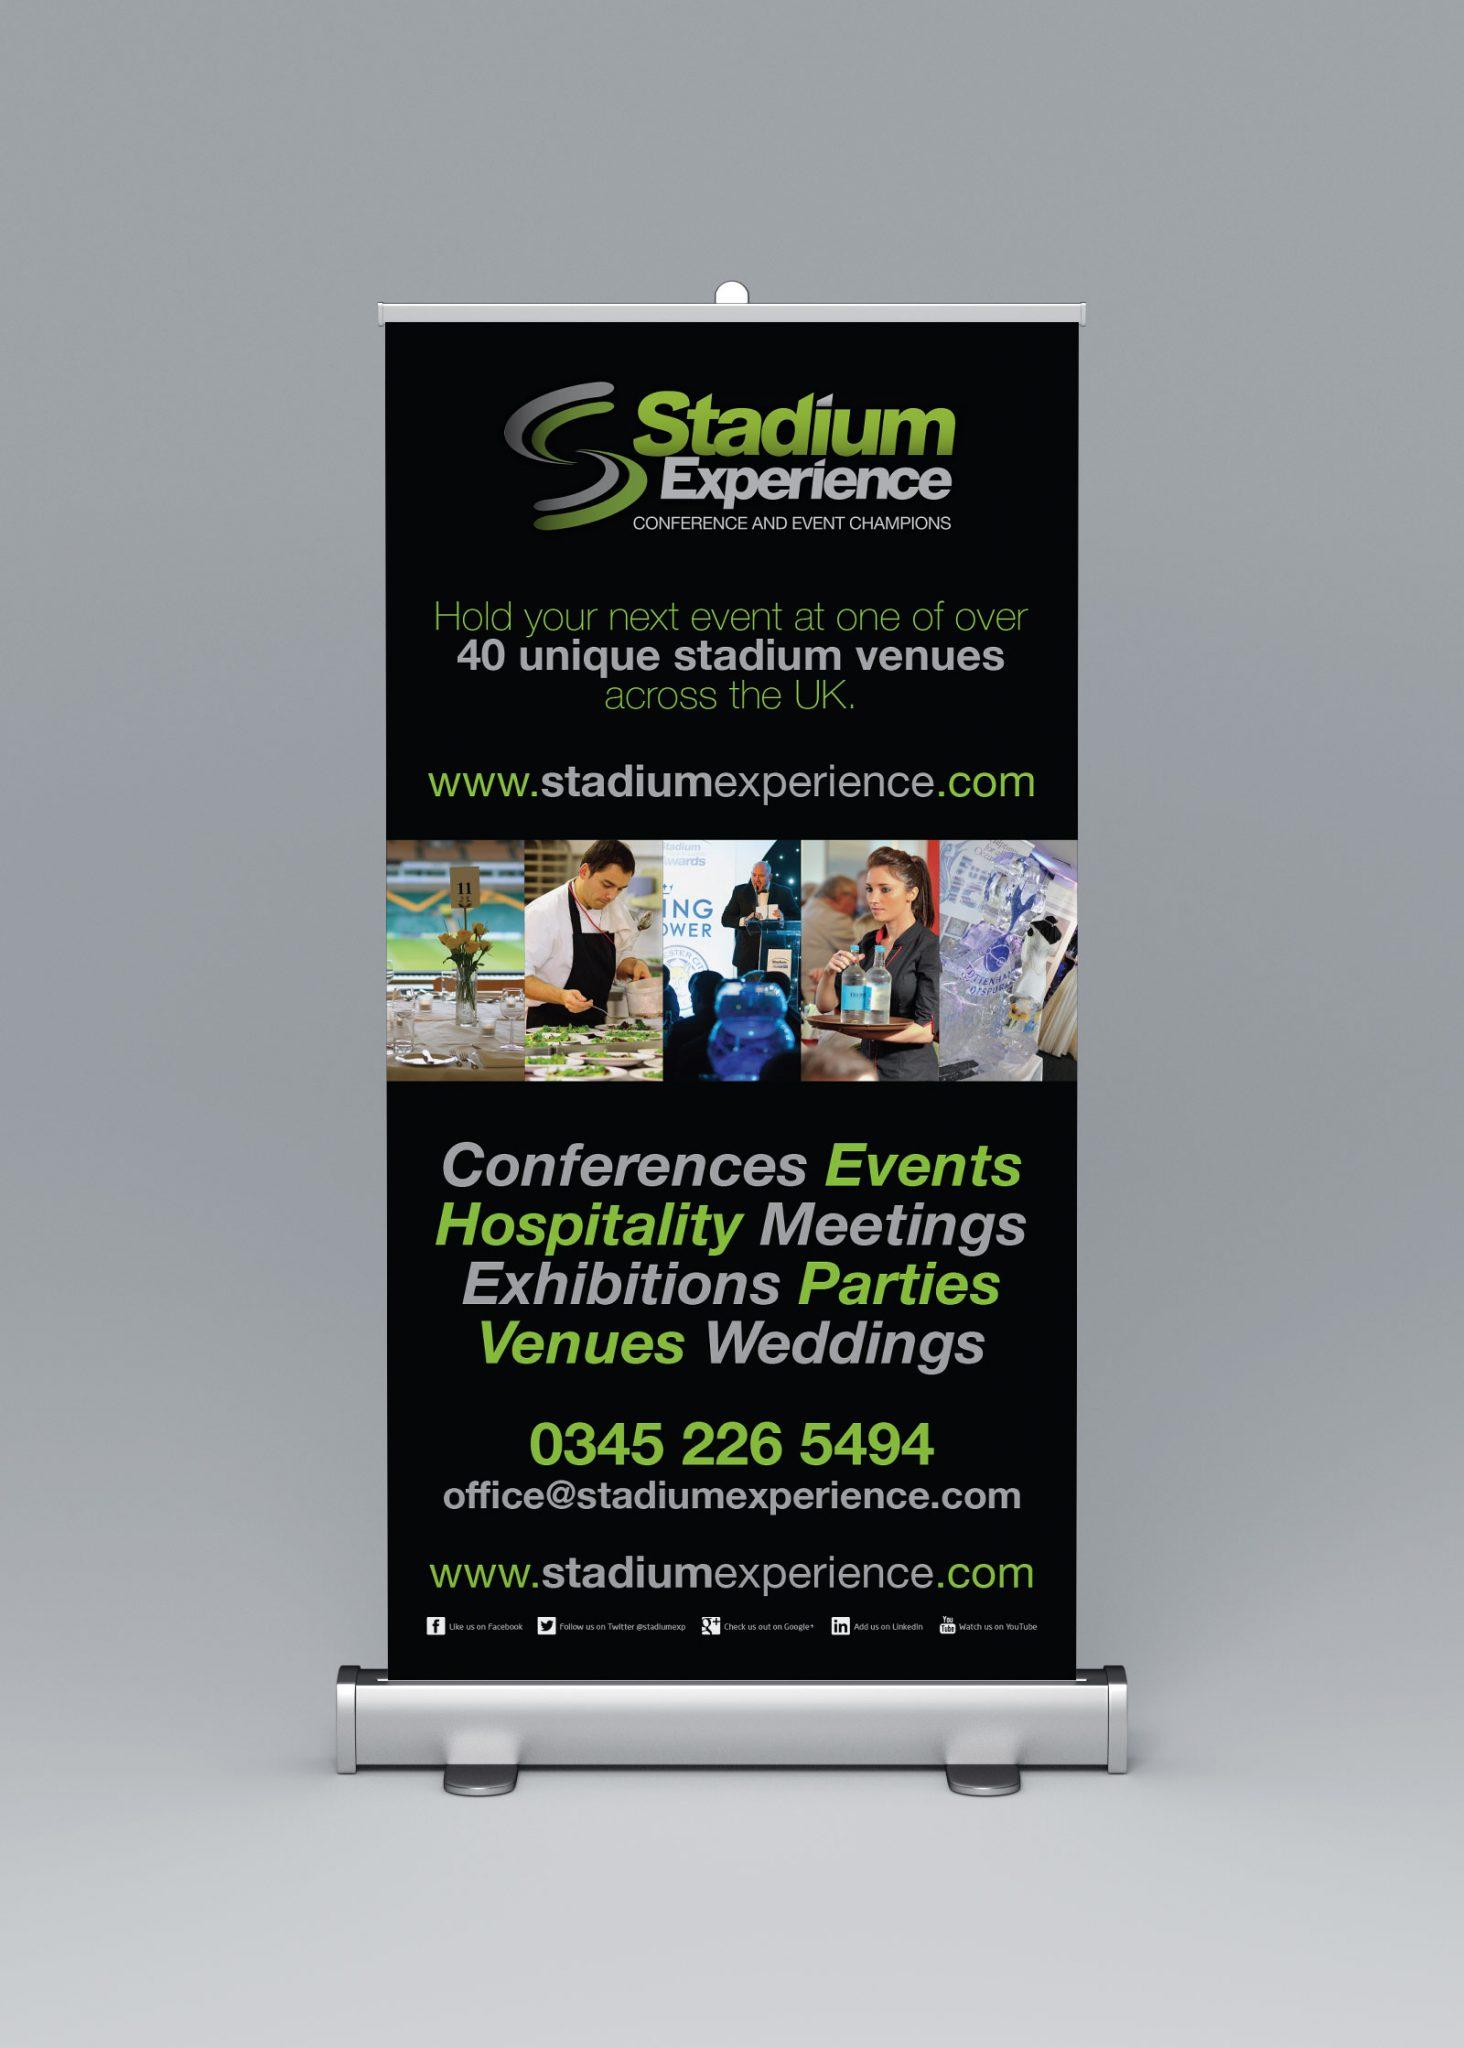 Stadium Experience Rollup Banner design